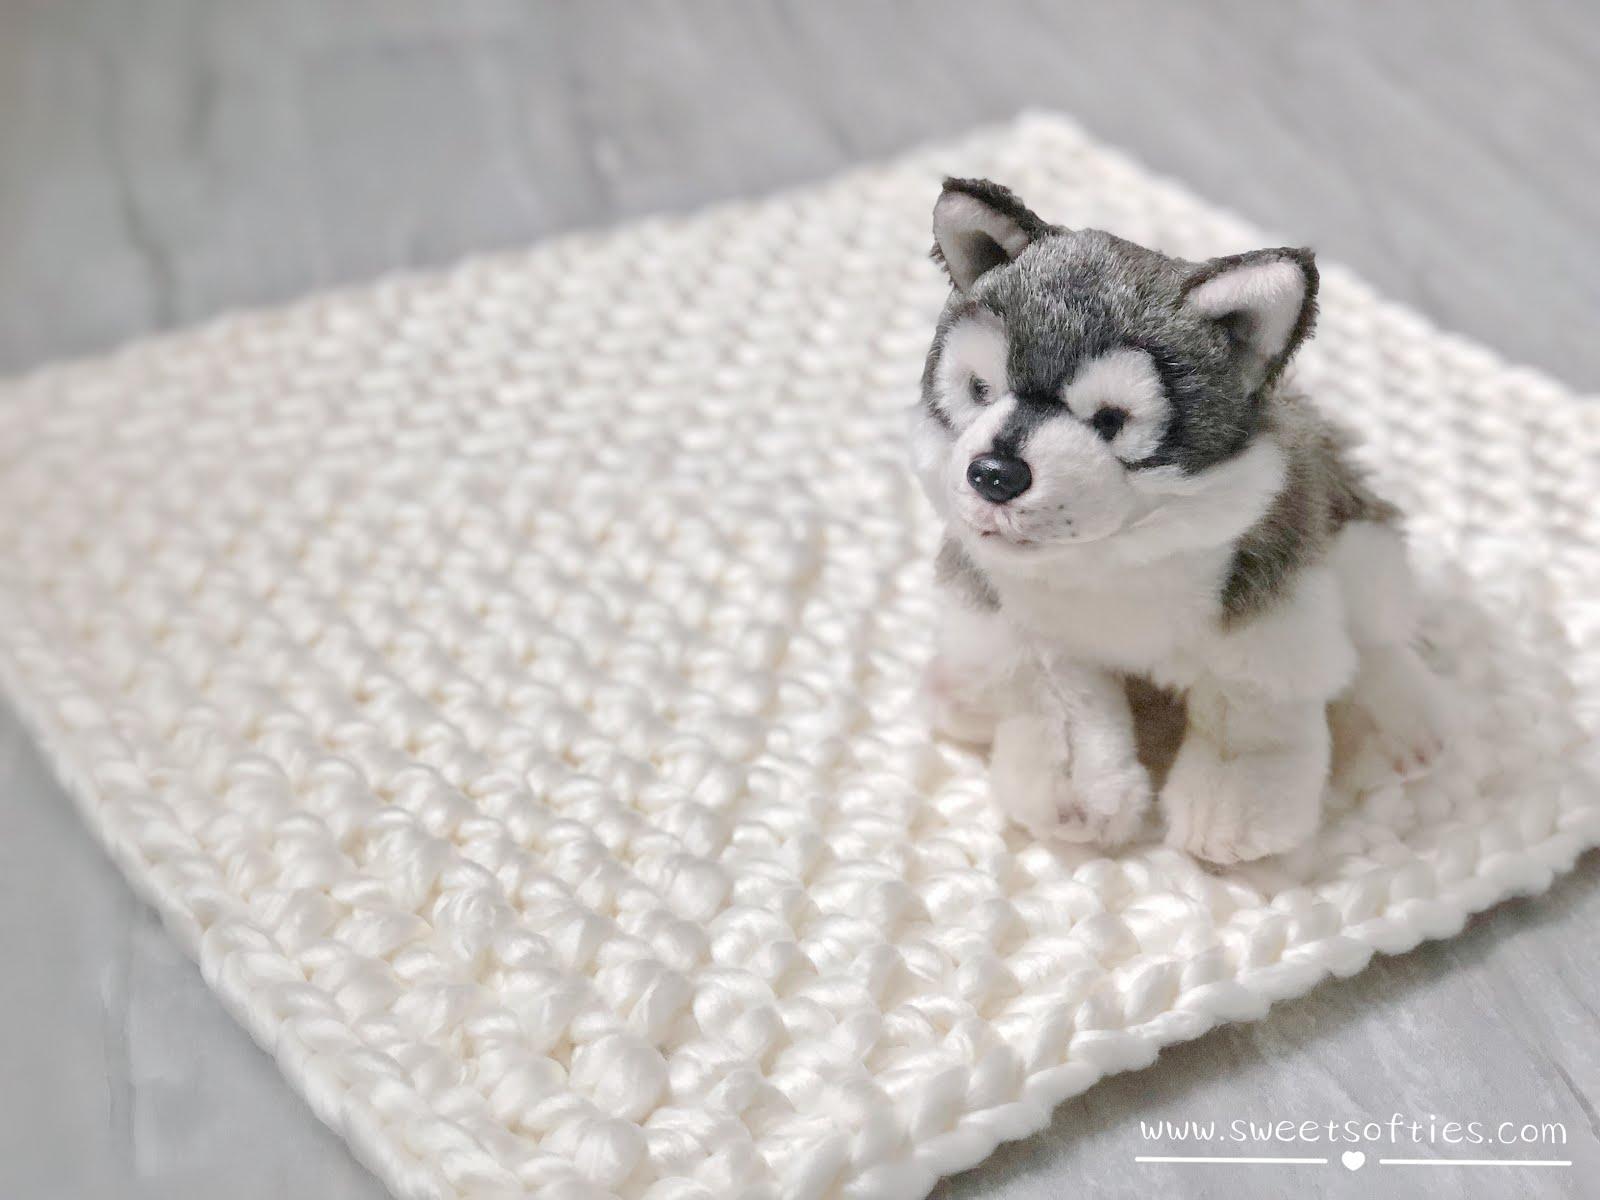 Amigurumi Today - Free amigurumi patterns and amigurumi tutorials | 1200x1600